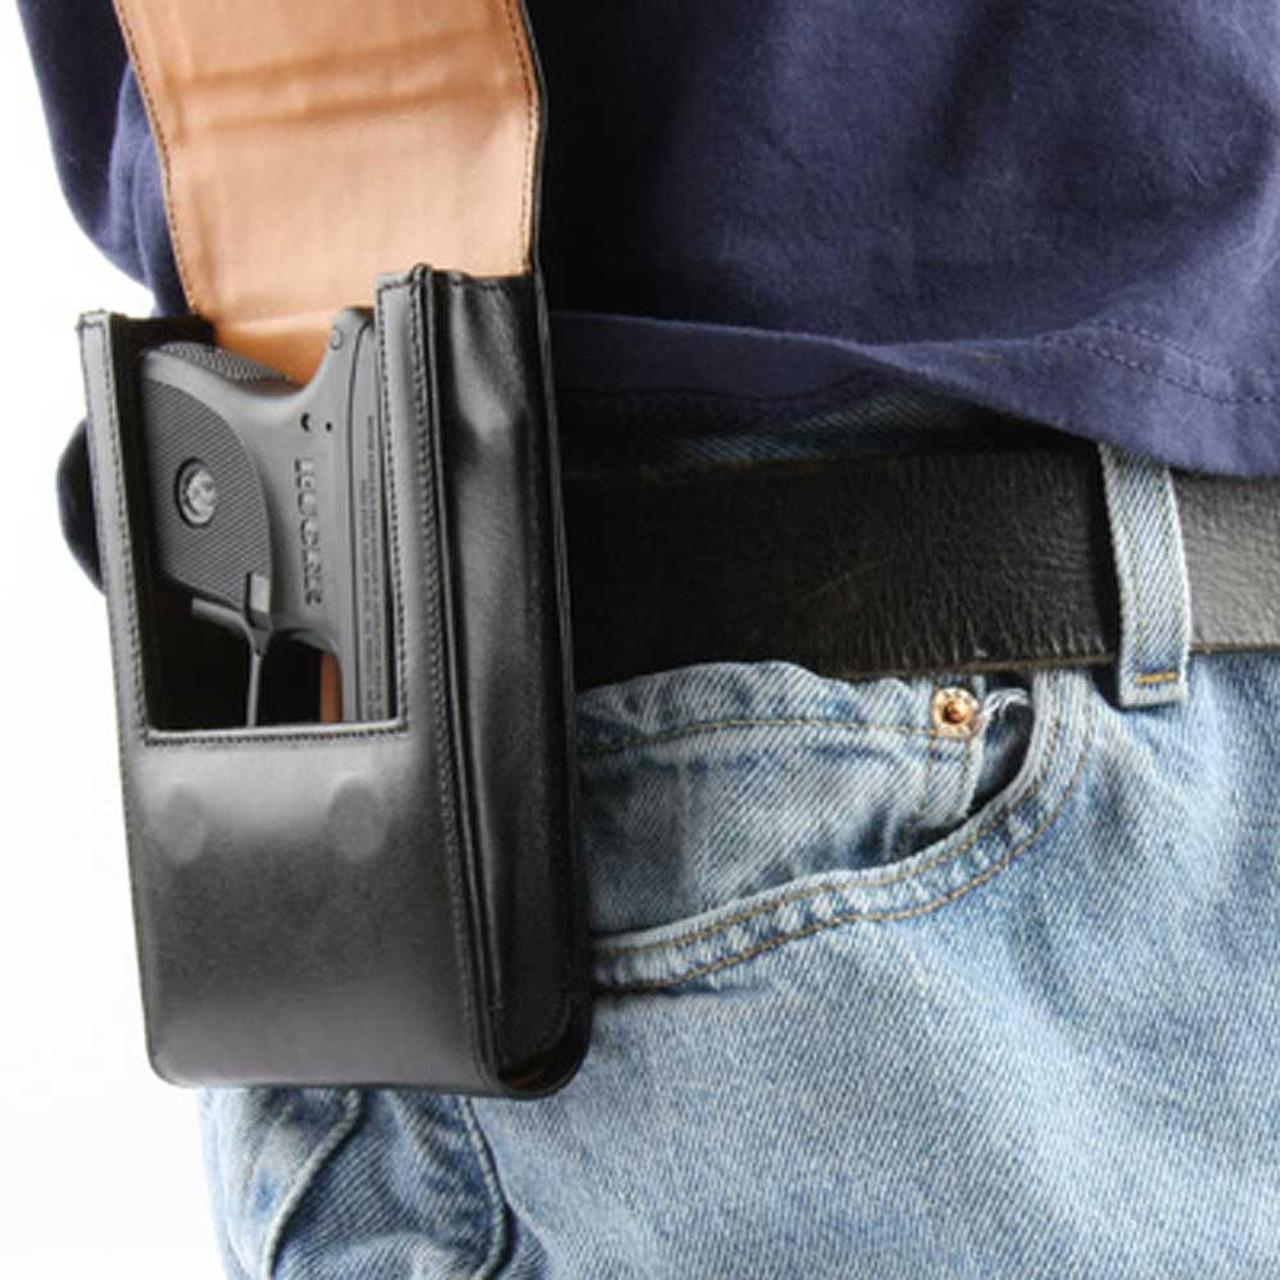 Ruger SR9c Sneaky Pete Holster (Belt Clip)